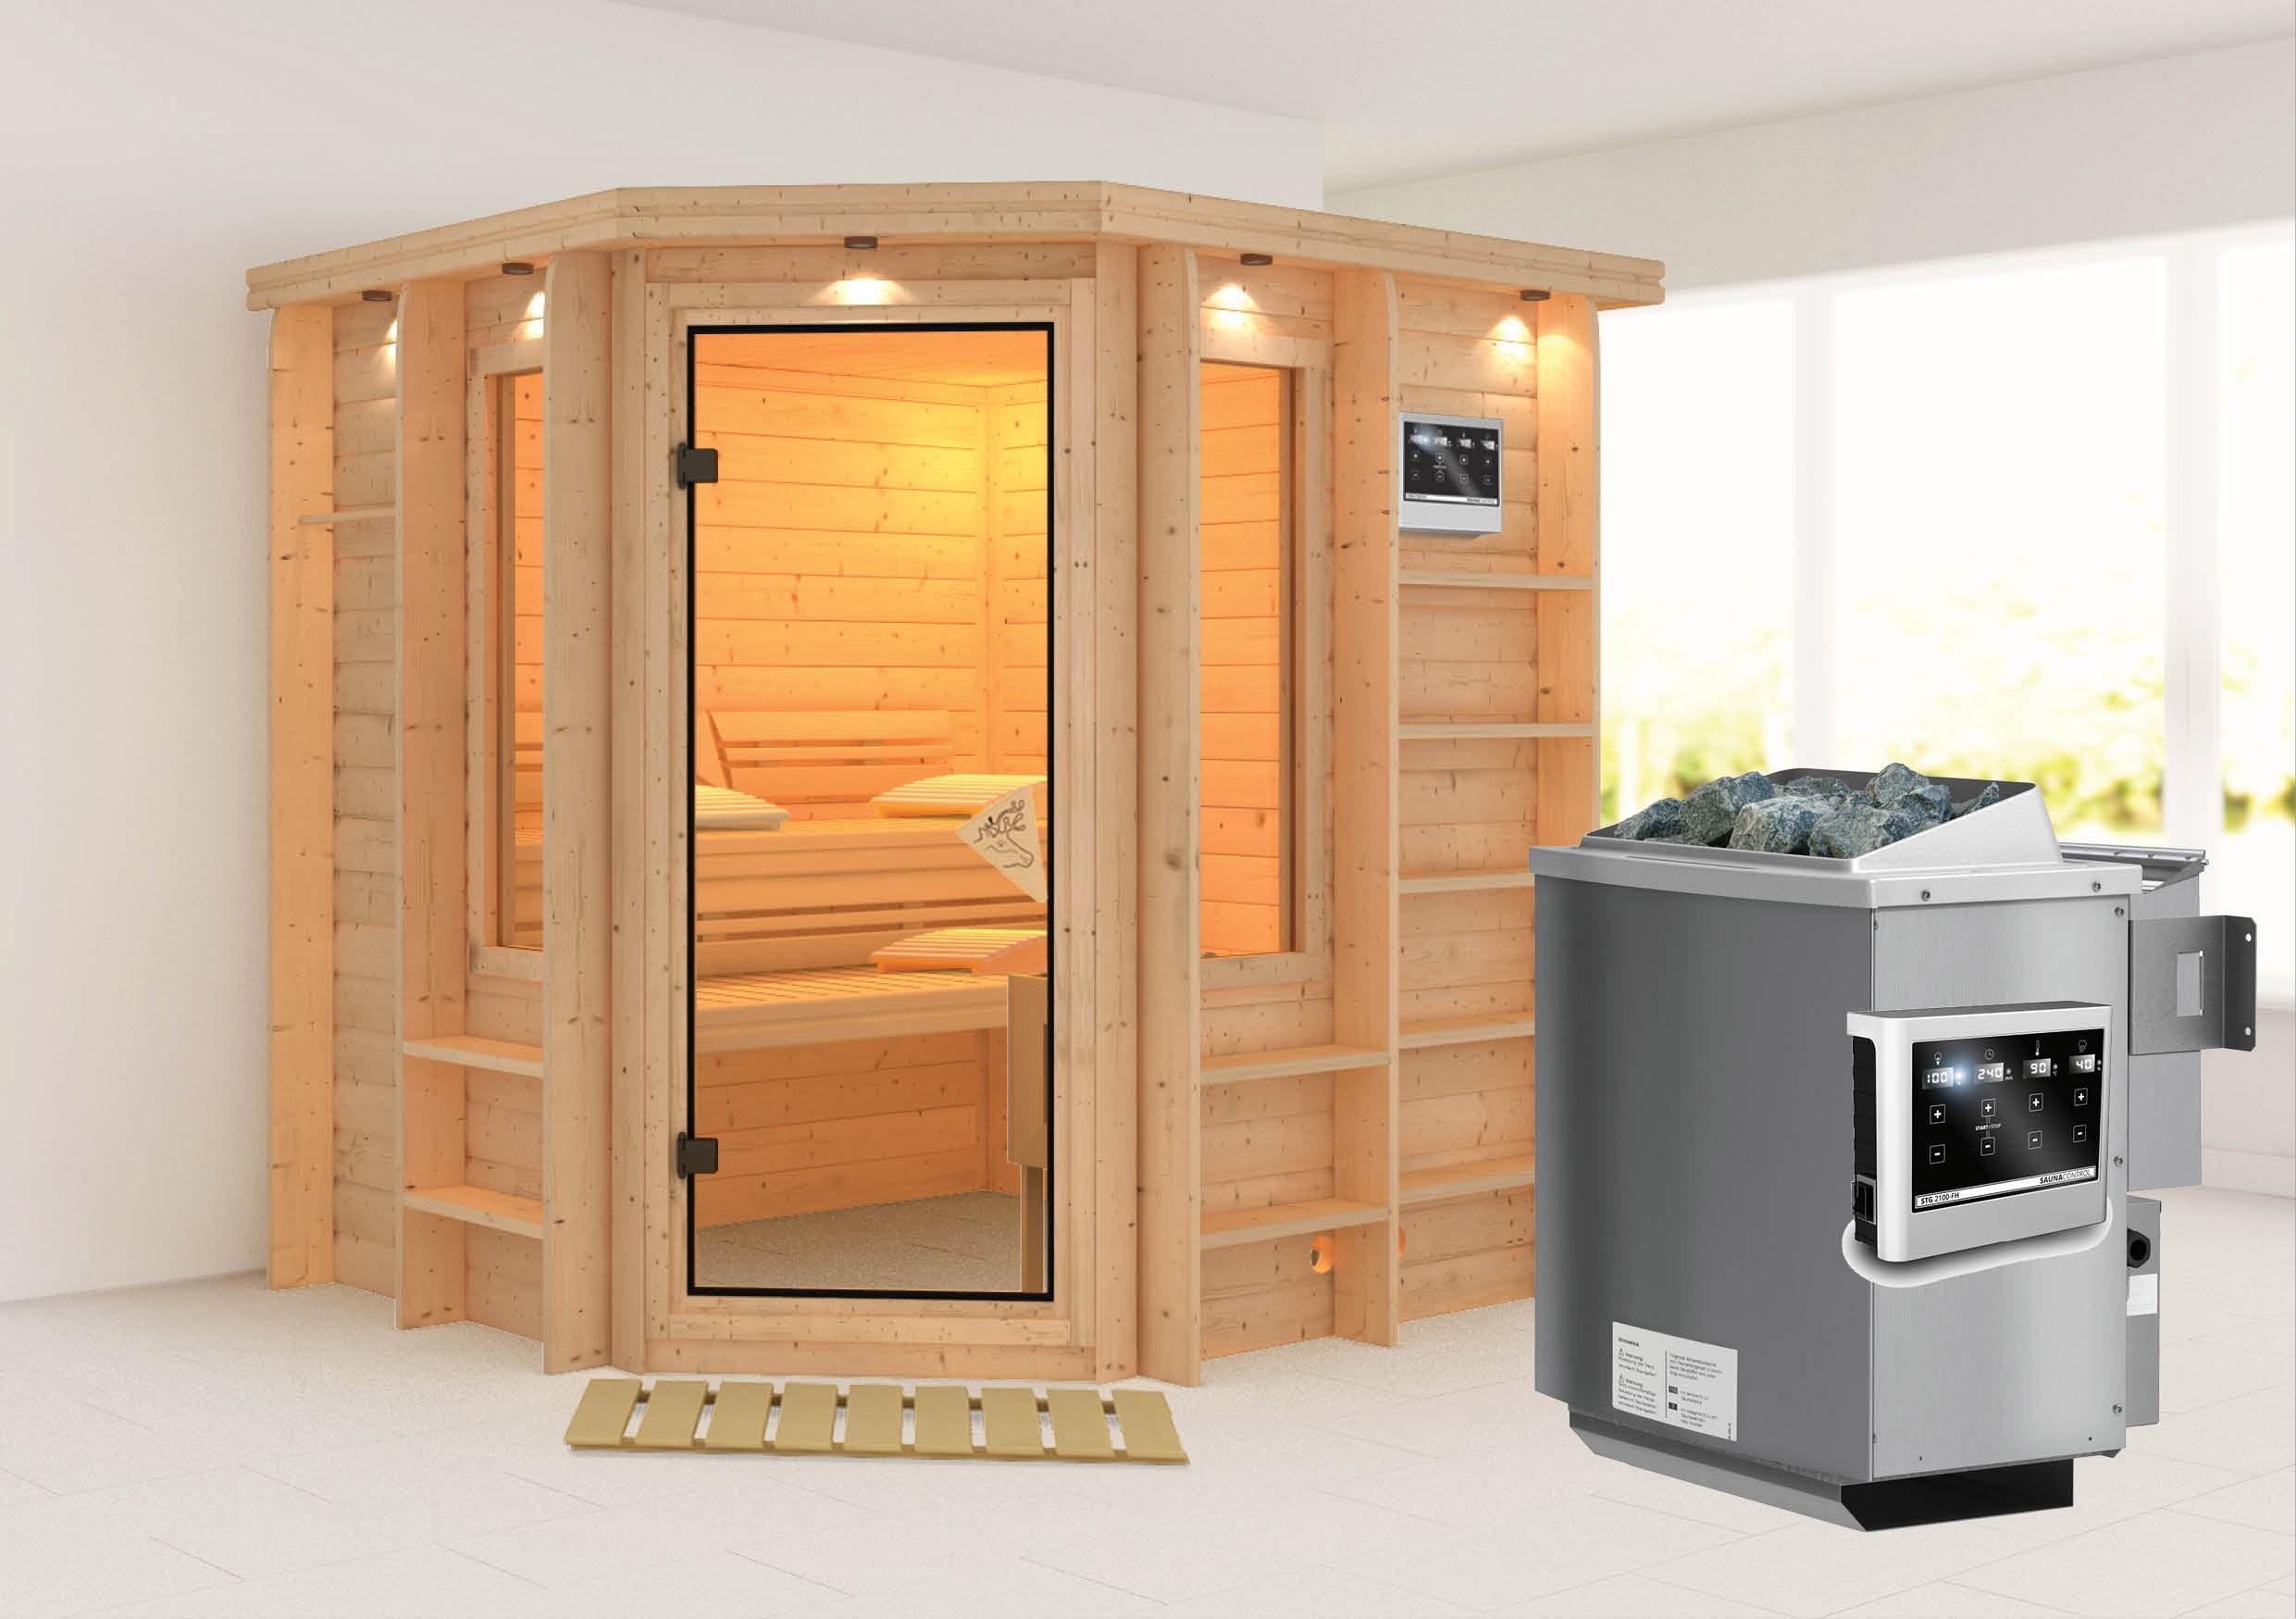 Karibu Sauna Cortona 40mm Dachkranz + Bio Ofen 9kW extern classic Tür Bild 1